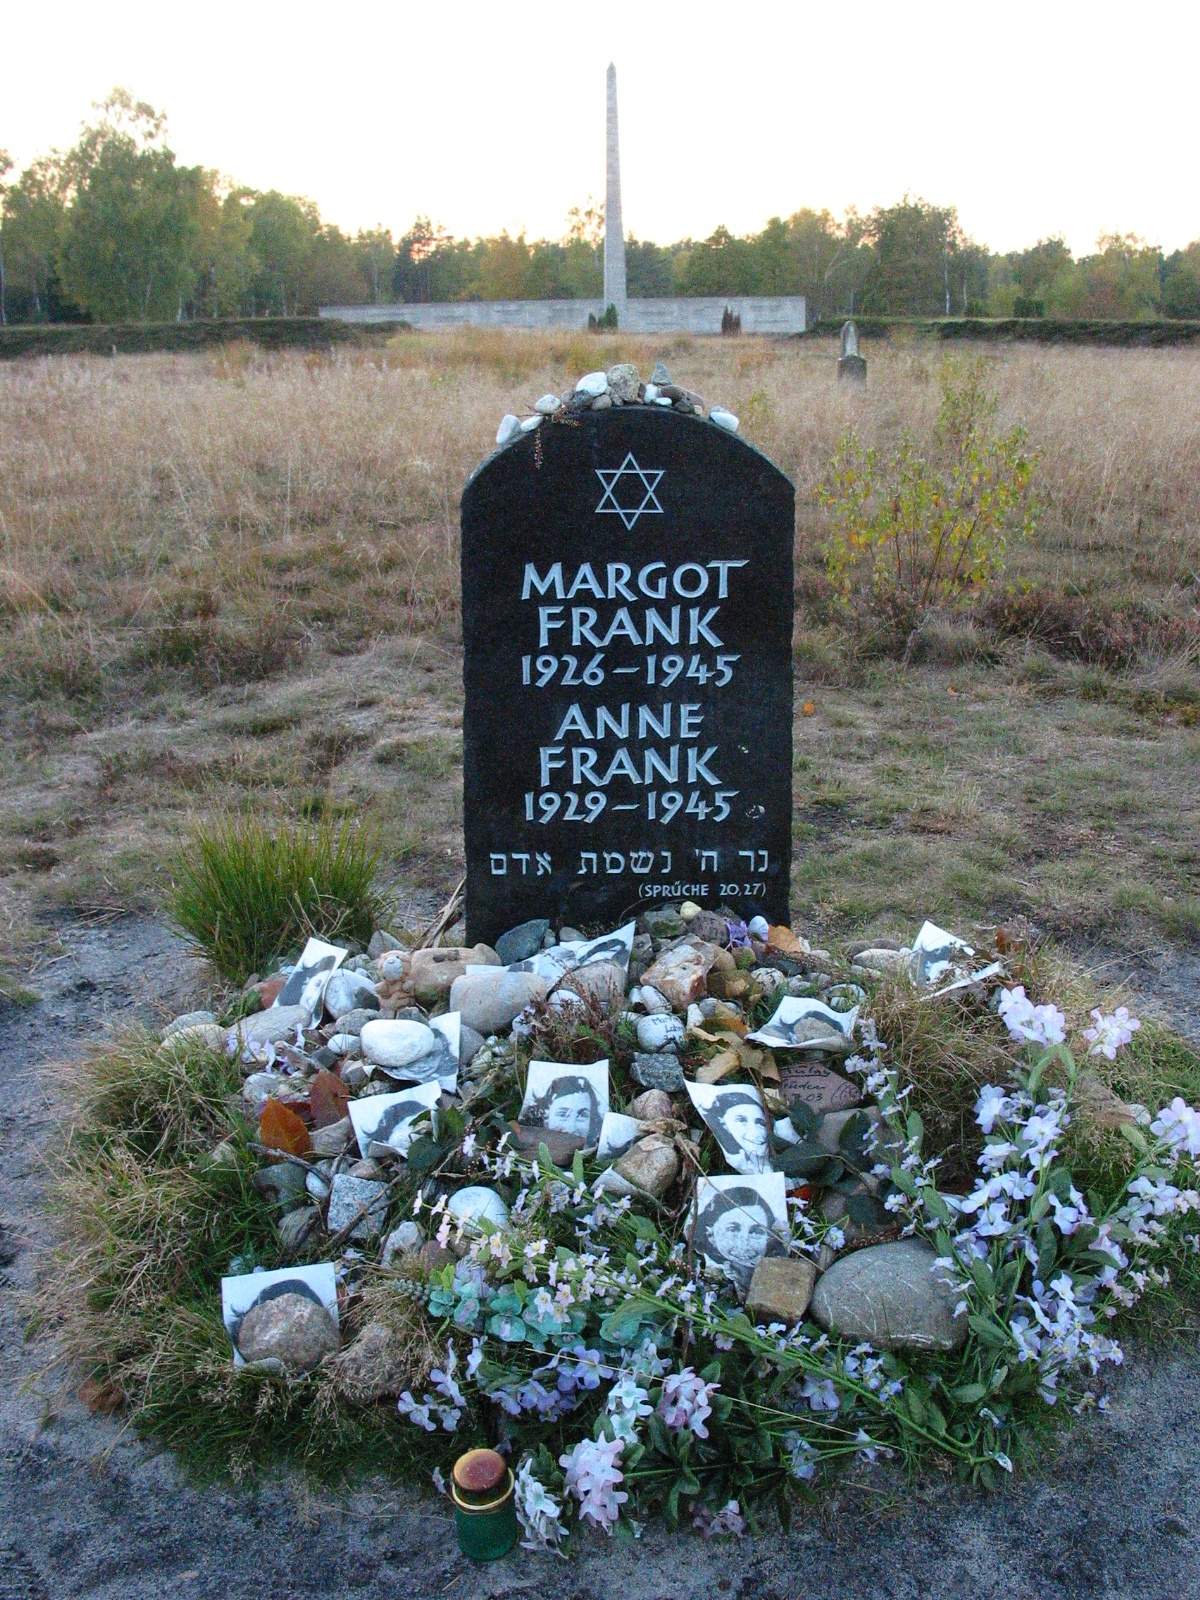 Anne_frank_memorial_bergen_belsen